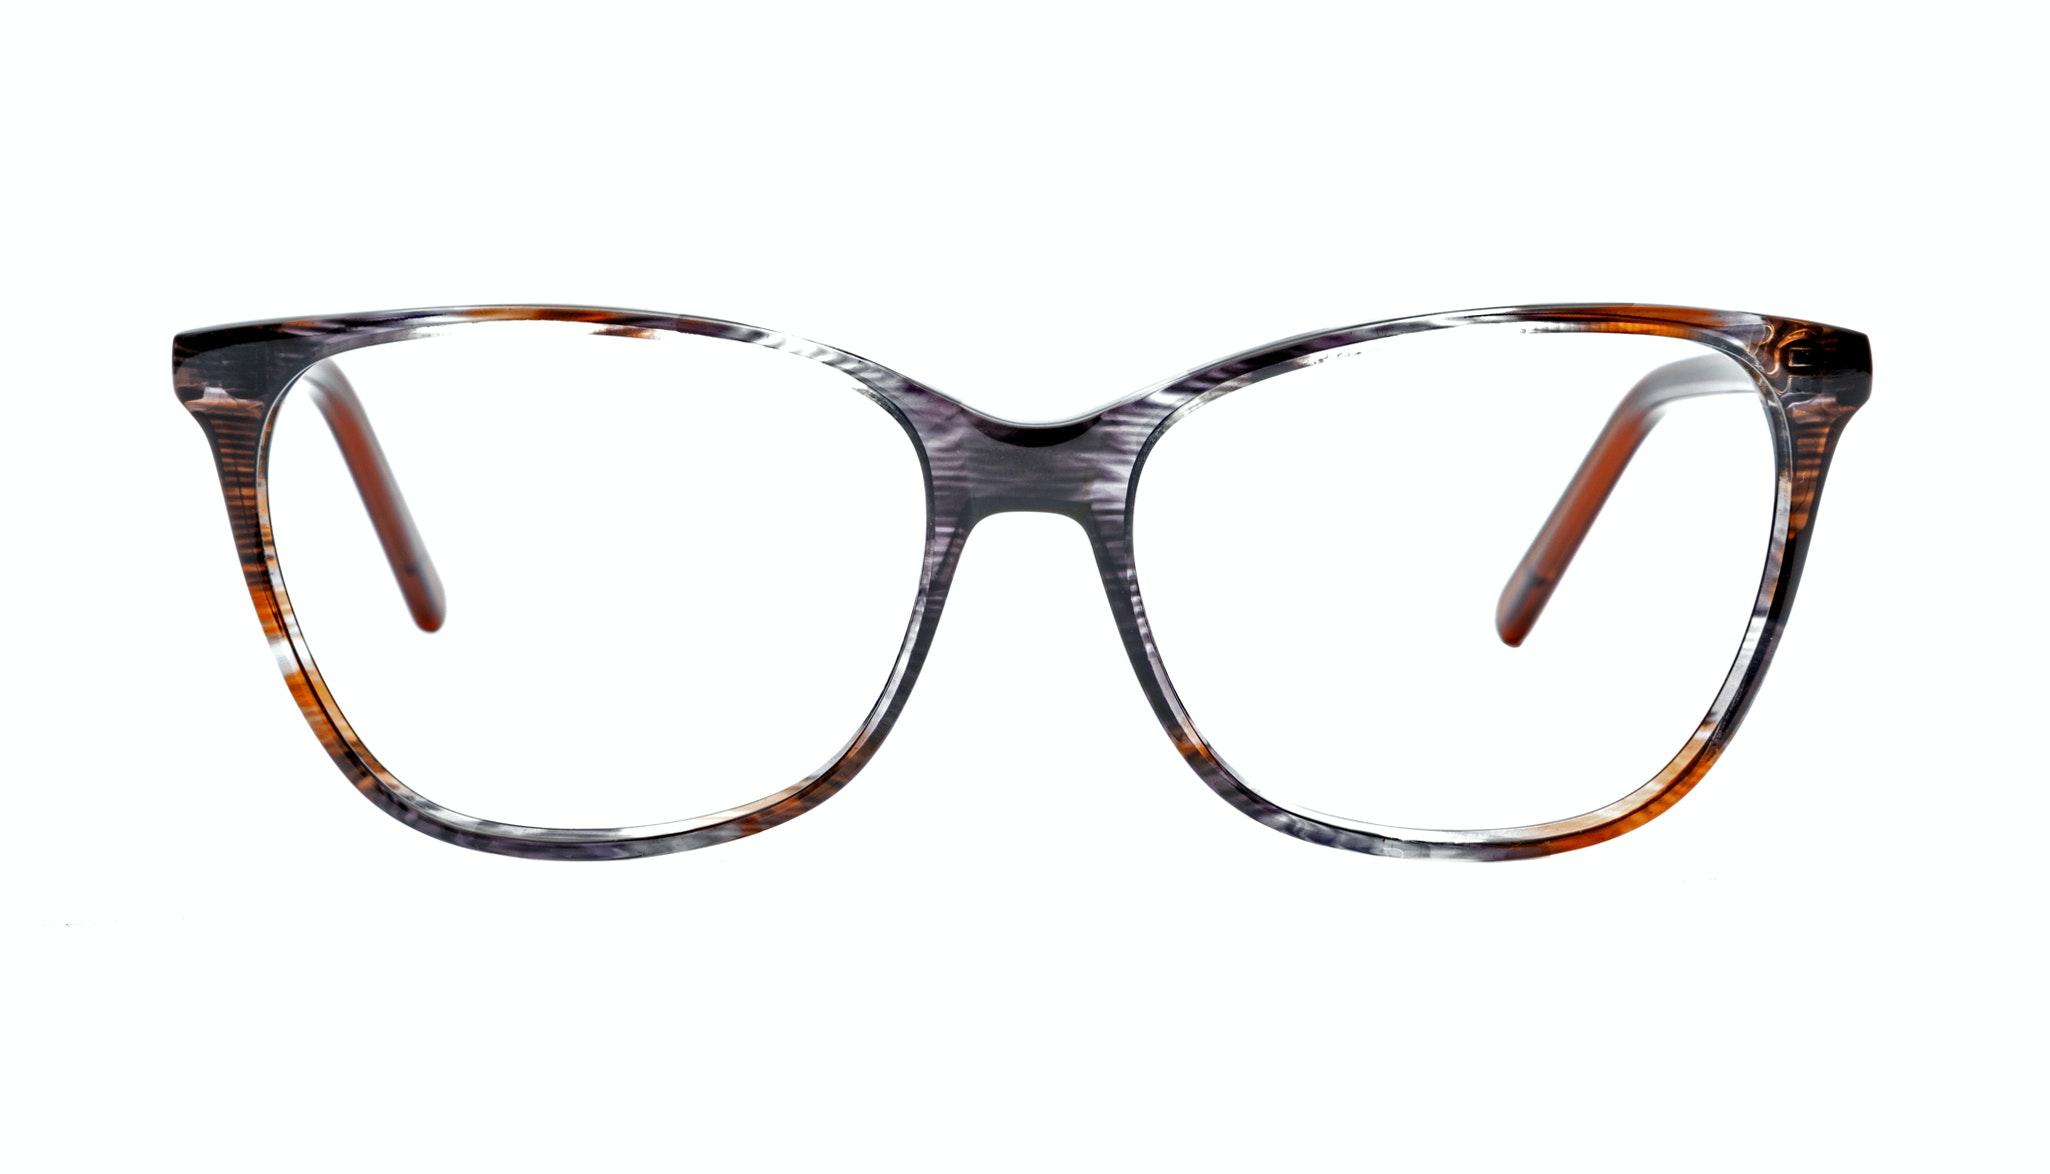 Affordable Fashion Glasses Cat Eye Eyeglasses Women Flair Tweed